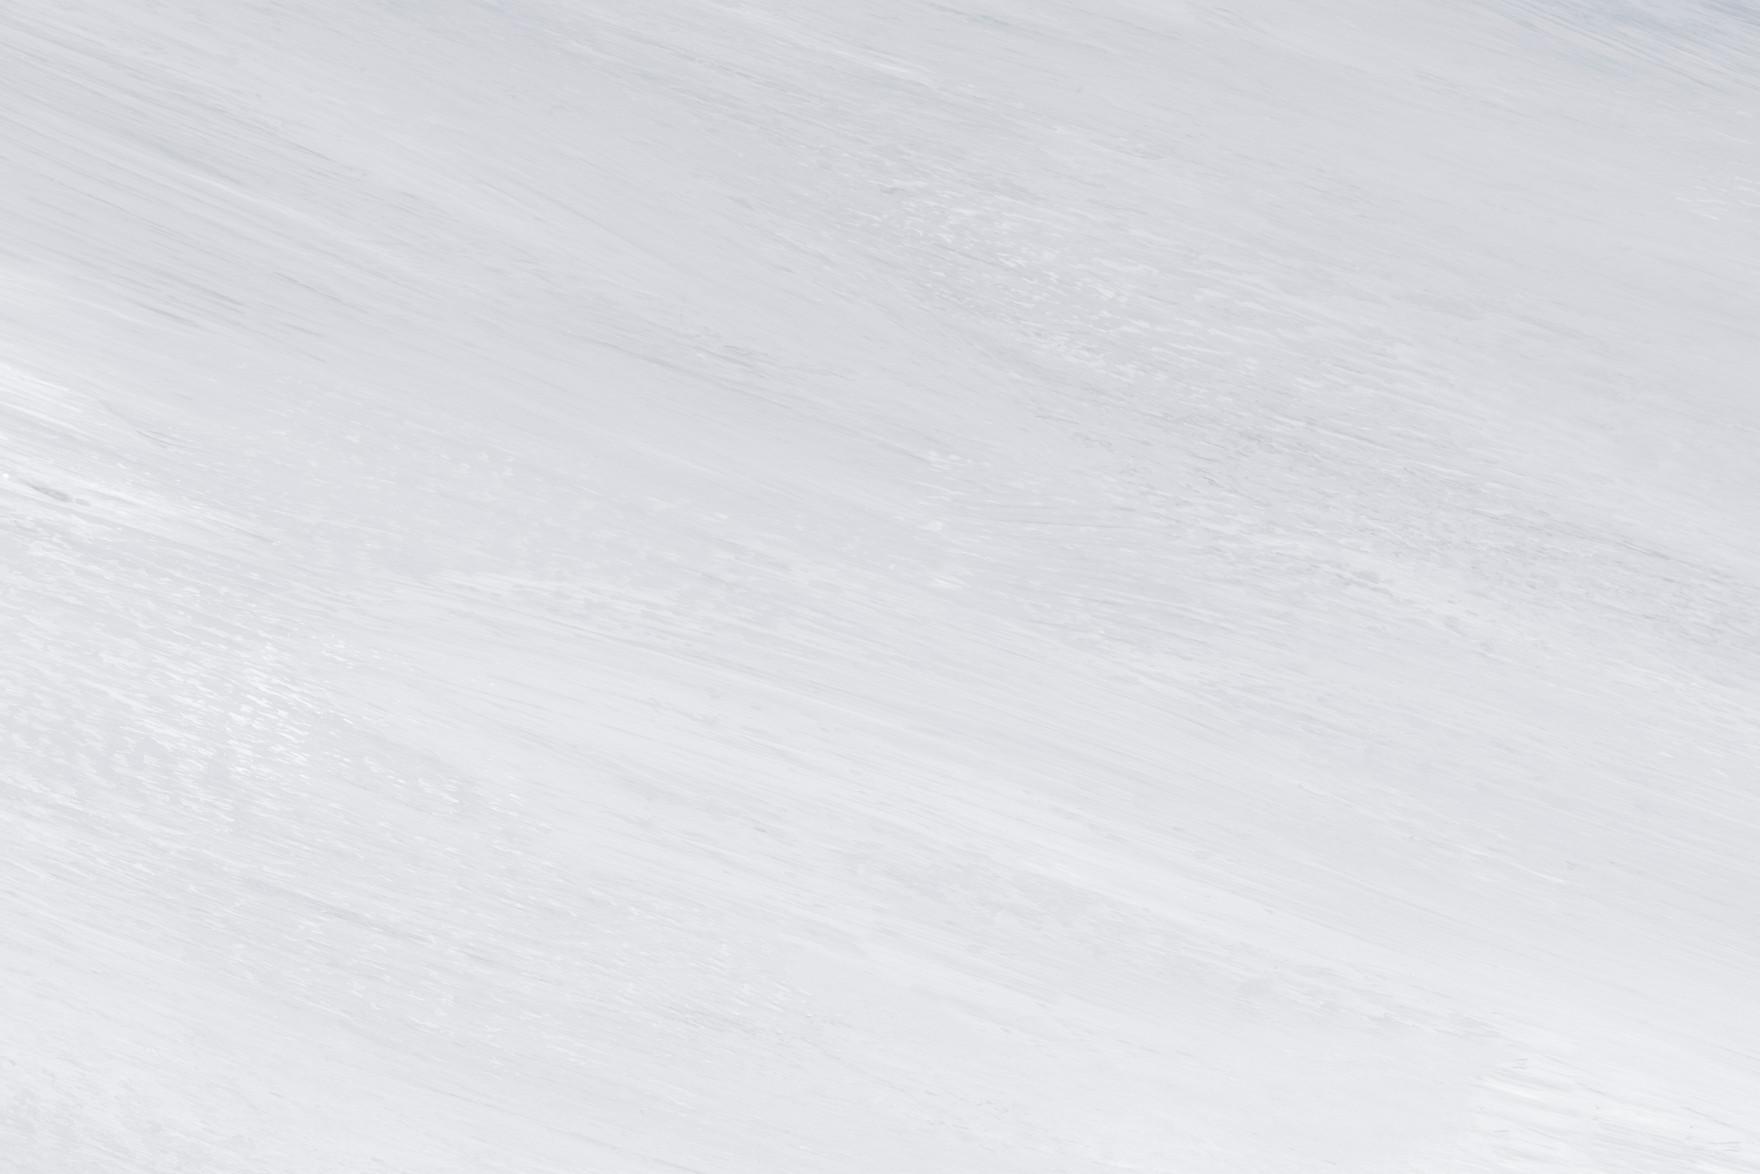 gray-oil-paint-textured-background.jpg